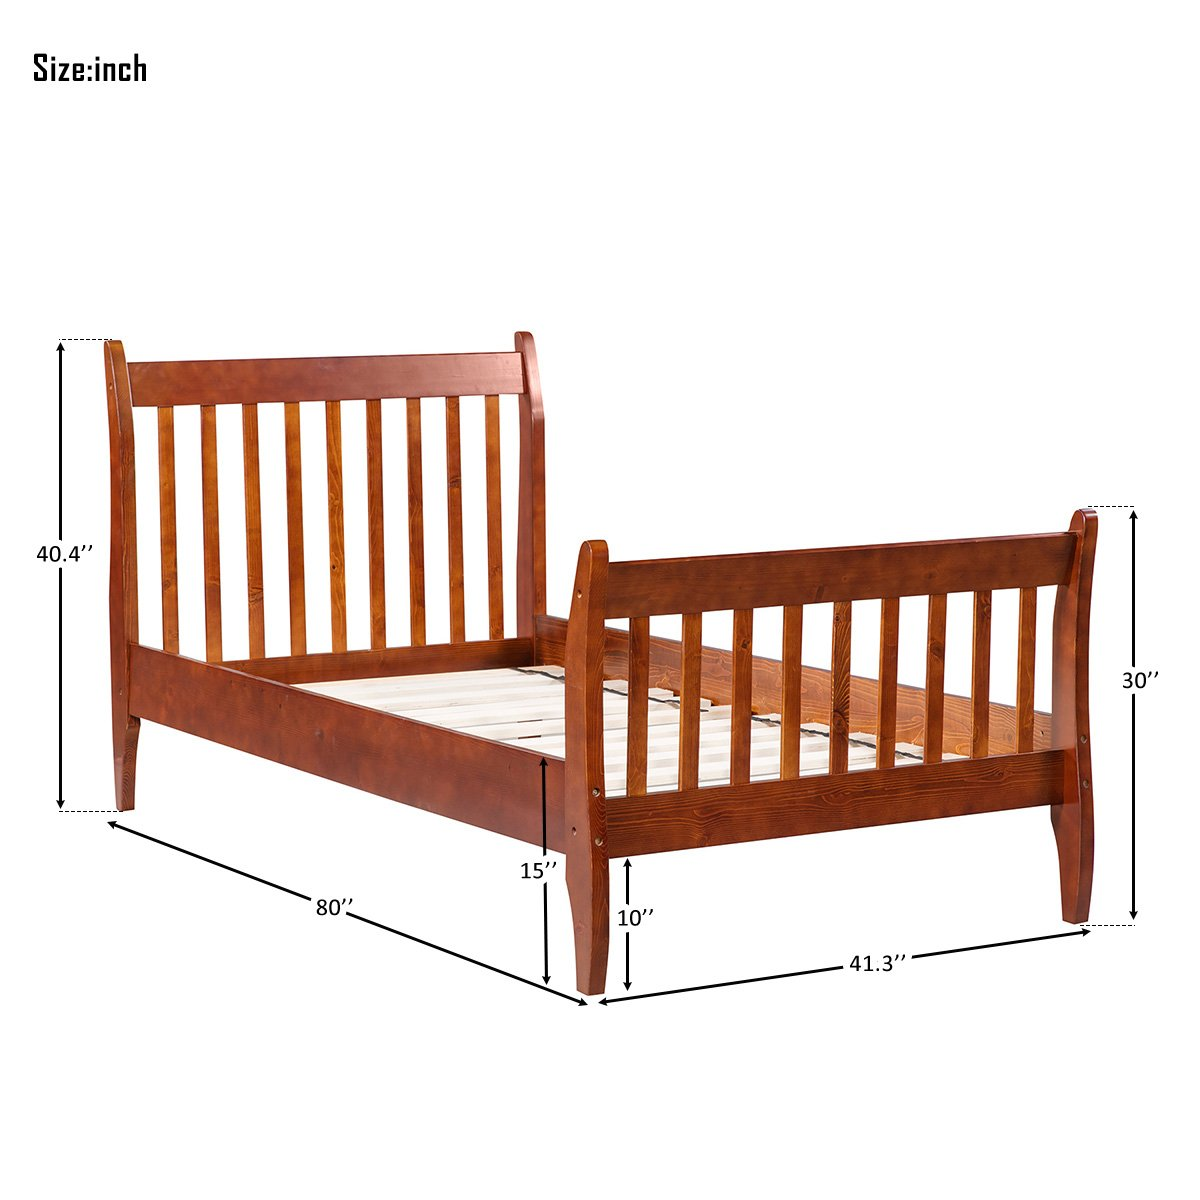 Merax with Wood Slat Support, Twin (Walnut.) Platform Bed Frame Mattress Foundation by Merax (Image #3)